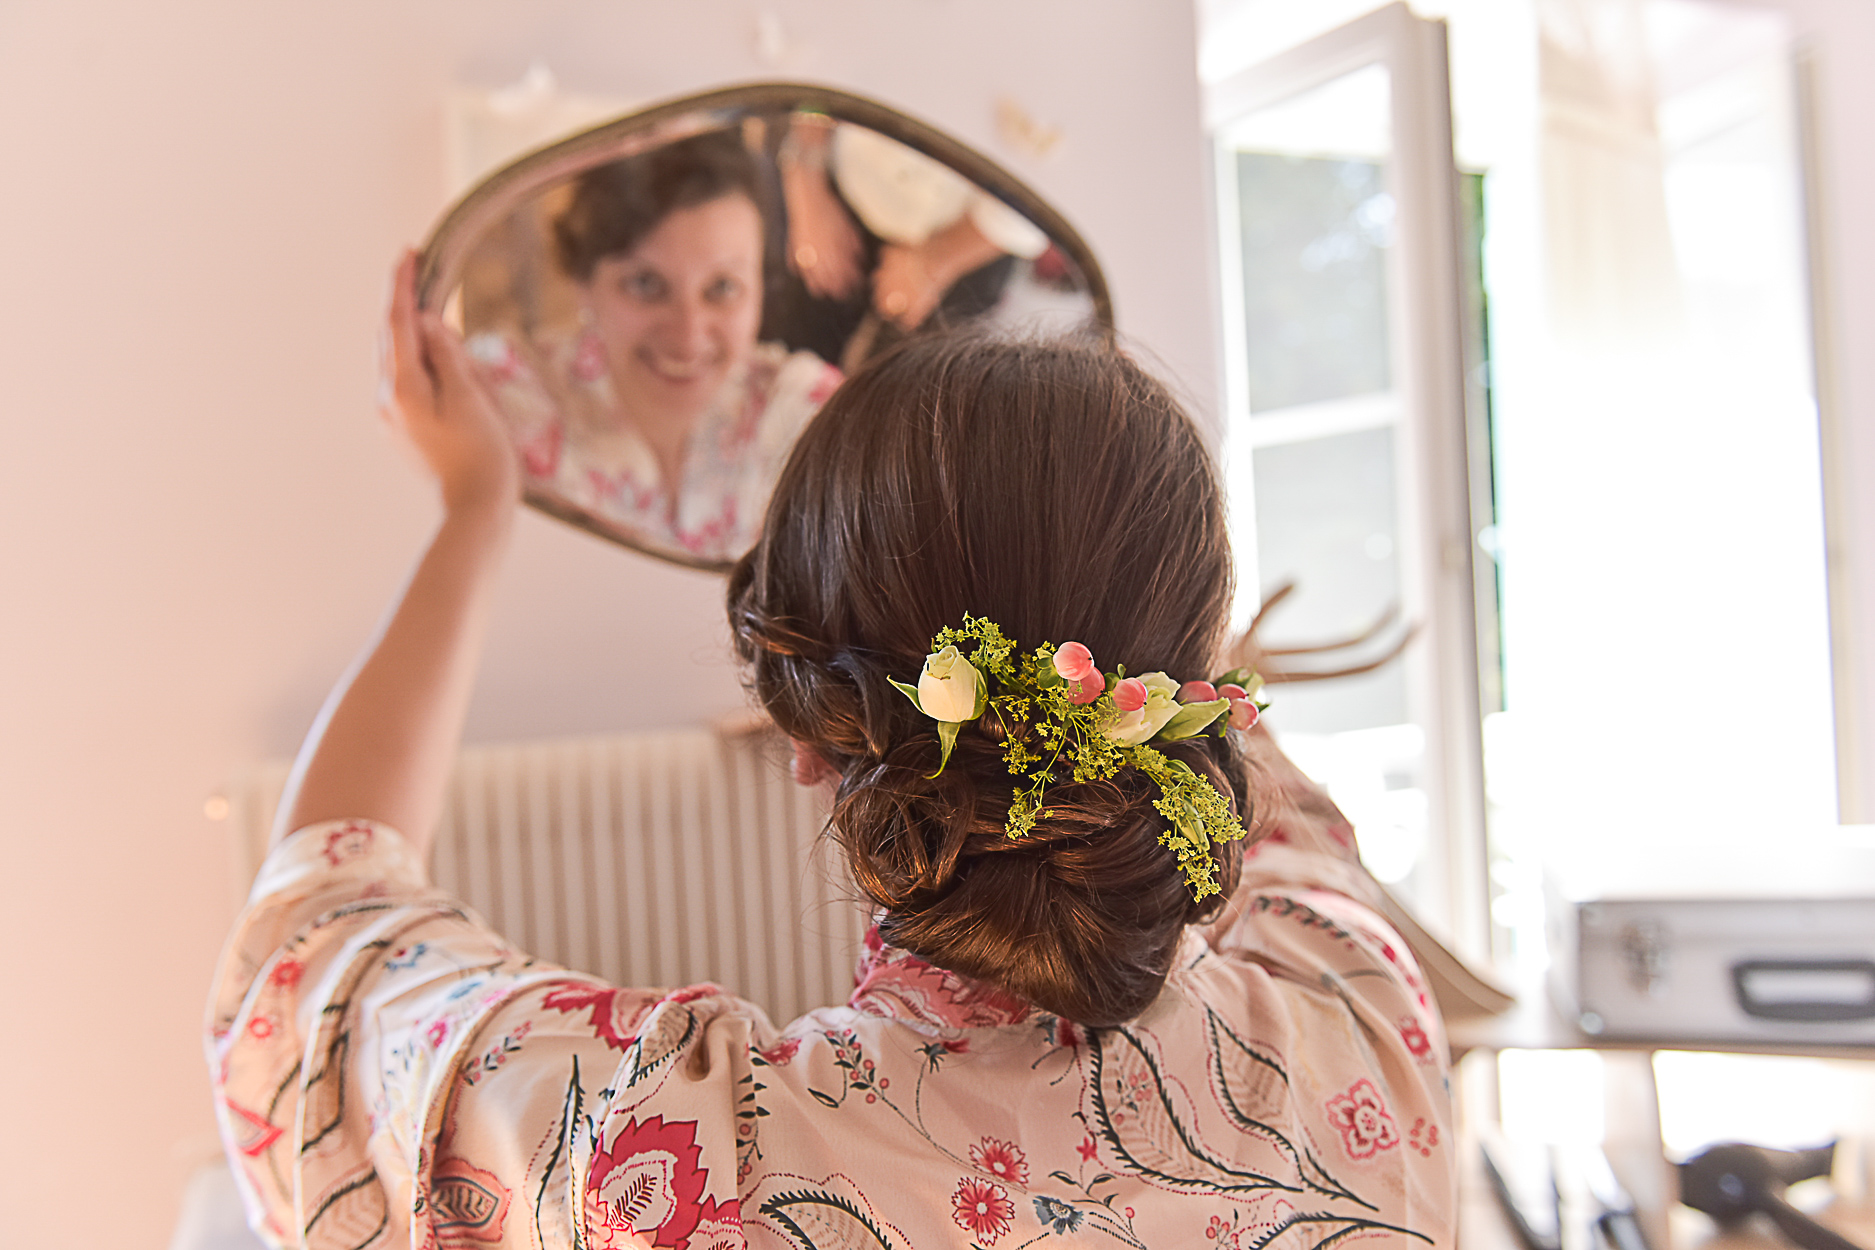 photographe-mariage-ile-de-france-preparatif-mariee-sonia